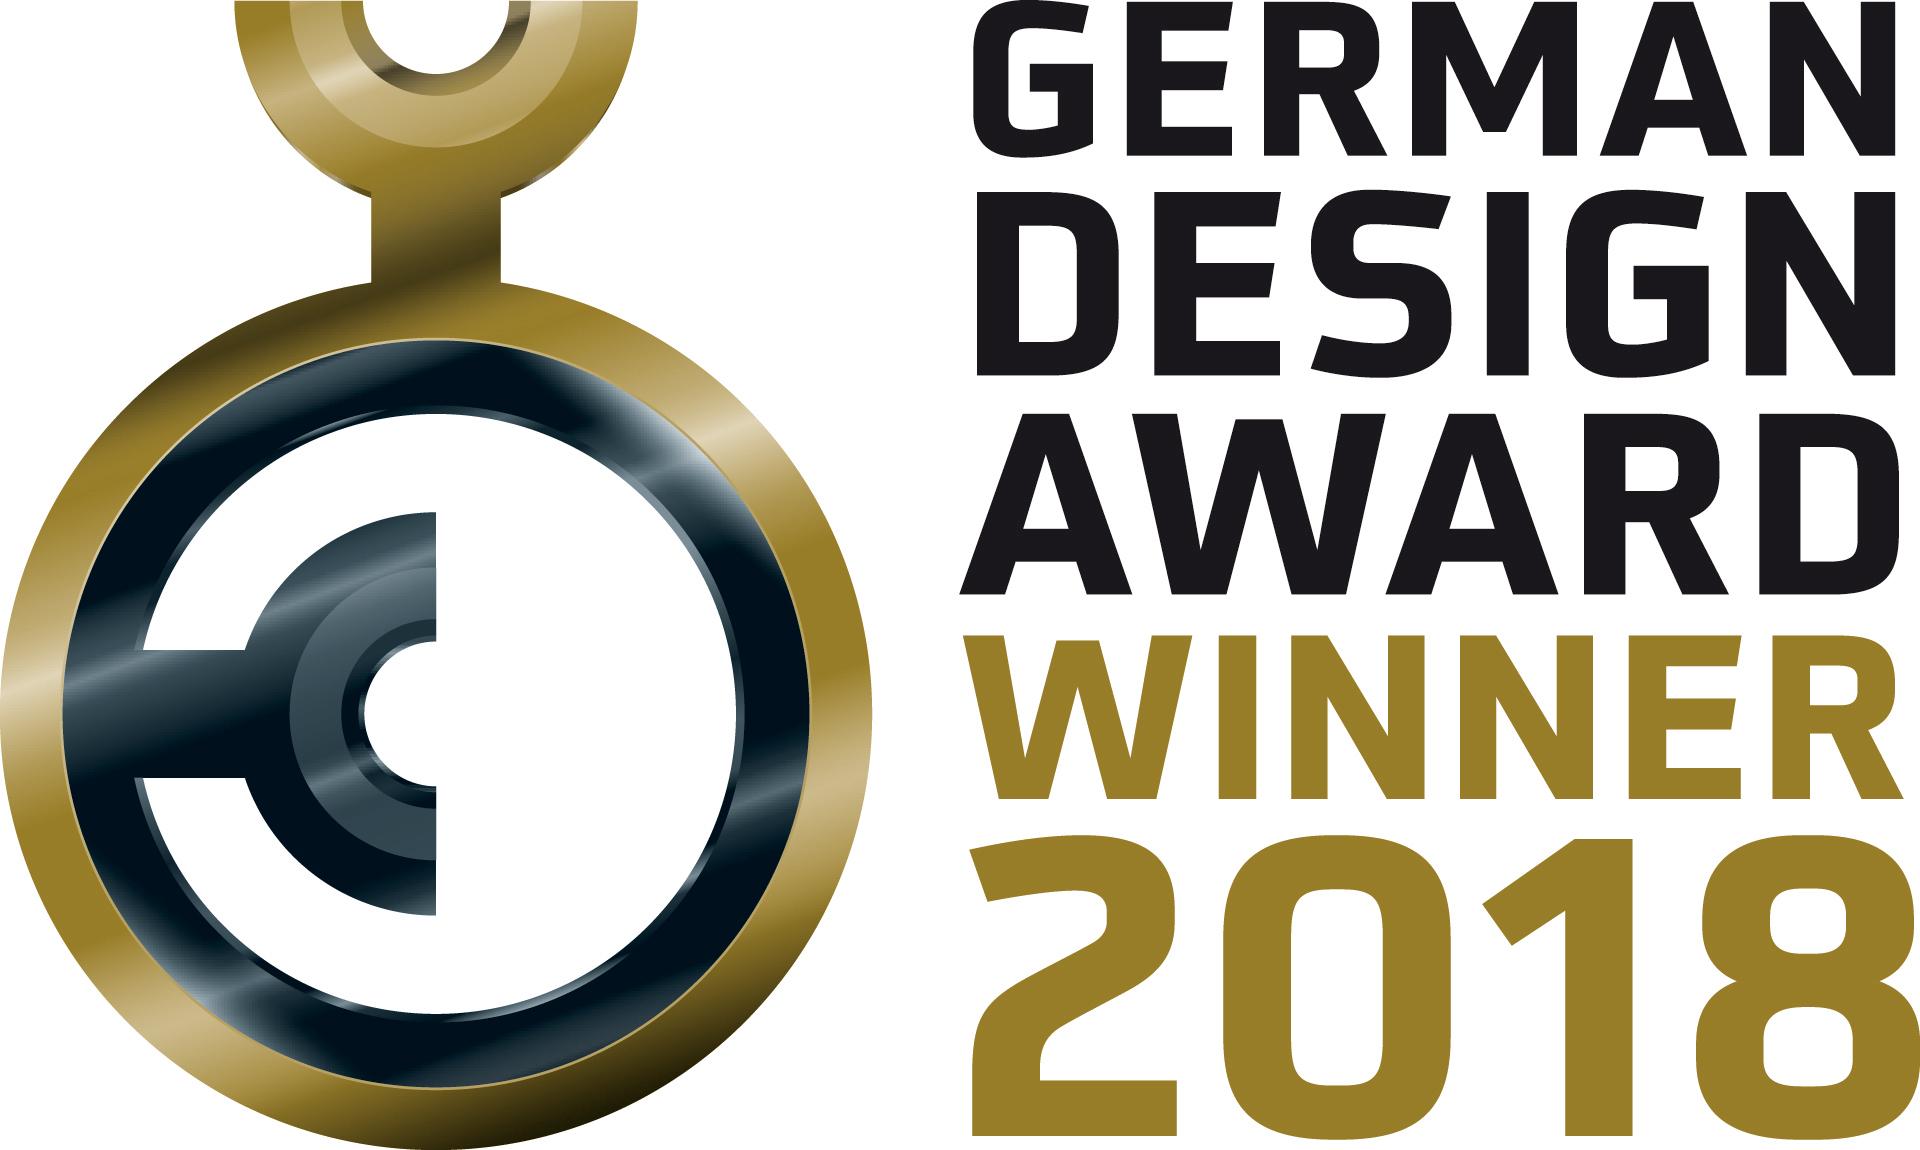 Logo German Design Award Winner 2018